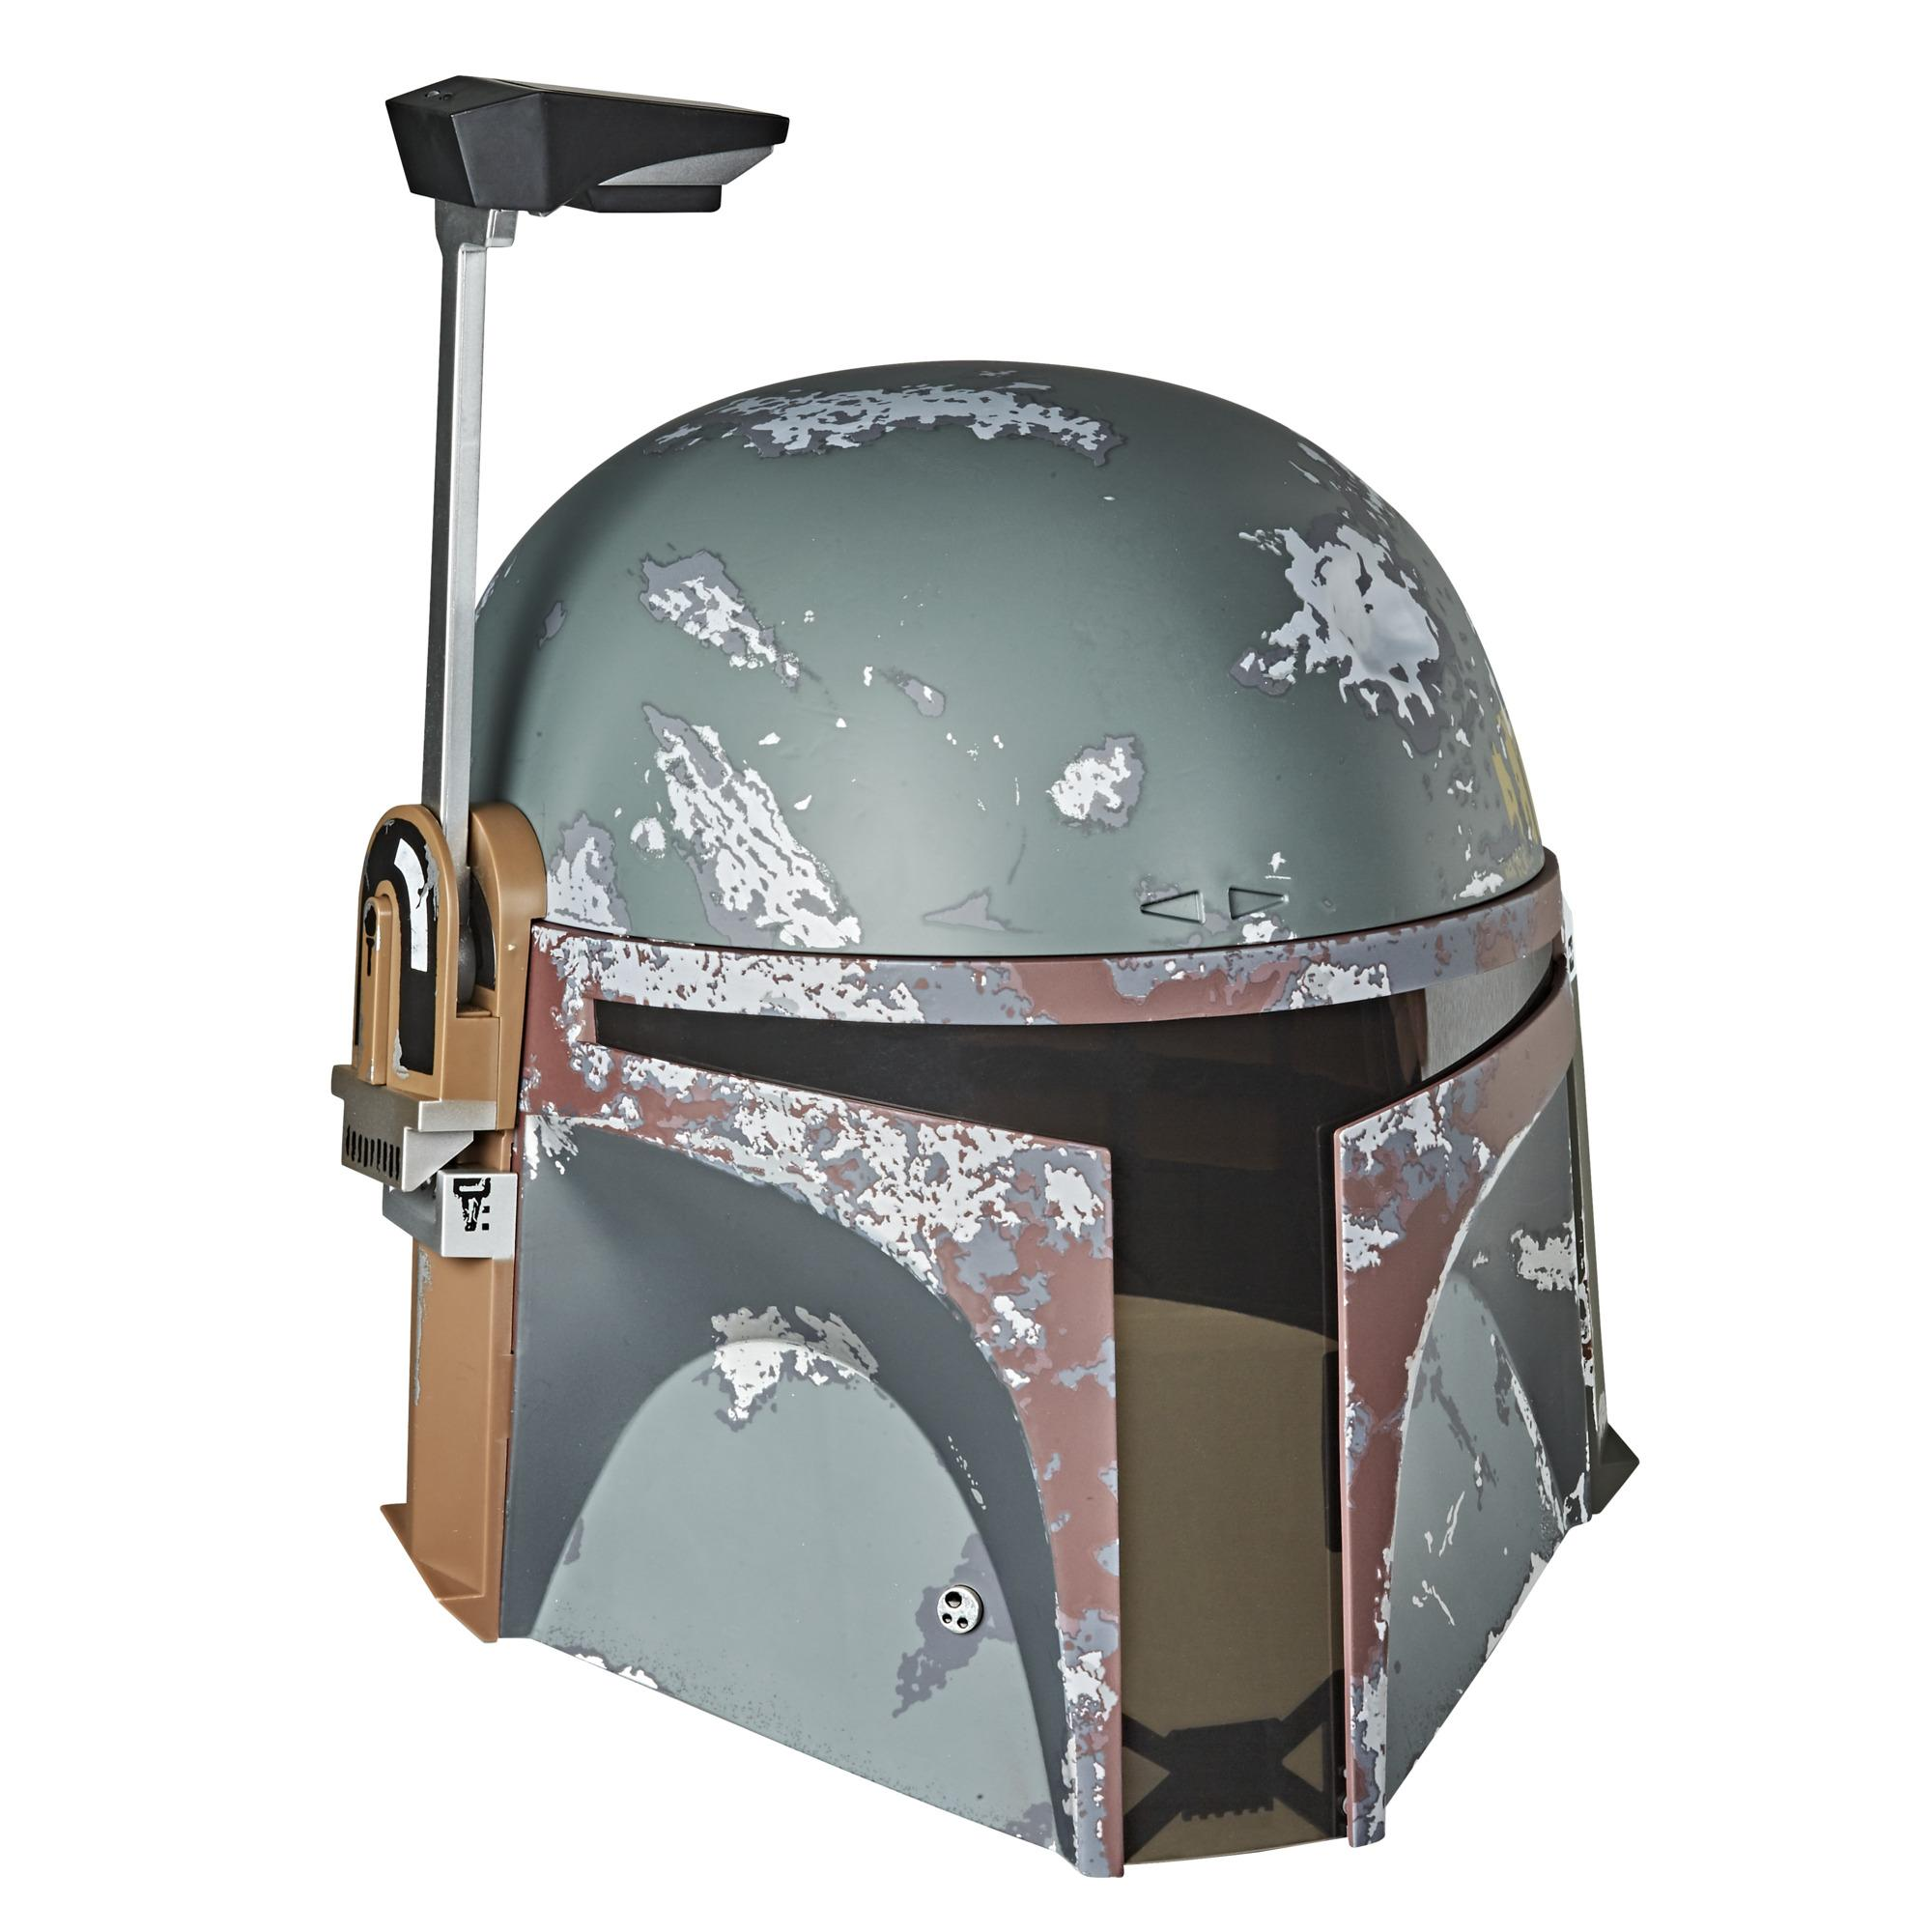 Star Wars The Black Series Boba Fett elektronischer Premium Helm